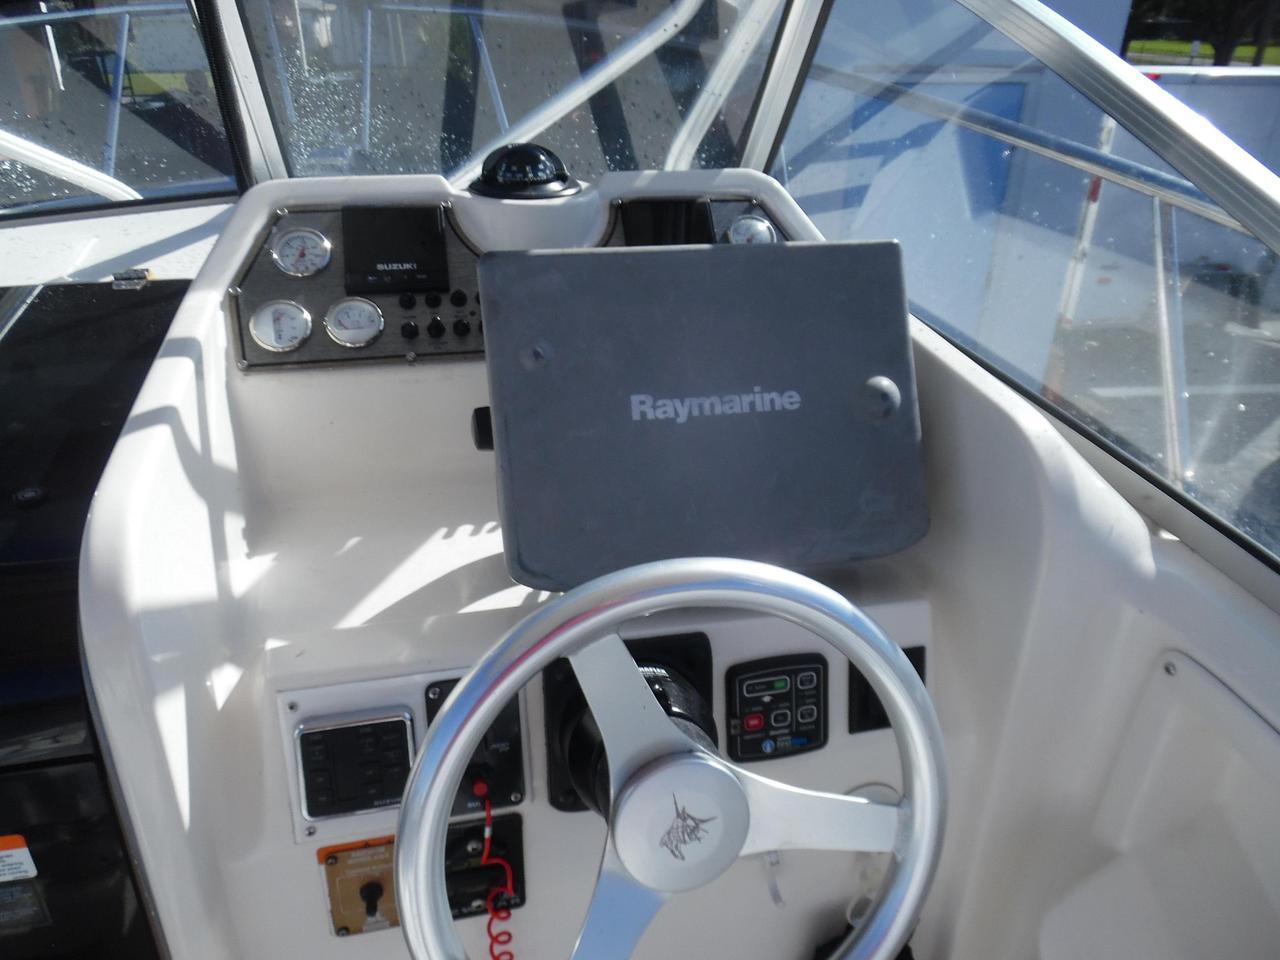 Aquasport Boat Wiring Diagram Electrical Diagrams Ski Nautique Harness Gauges Trusted Sailboat 2003 Used 250 Explorer